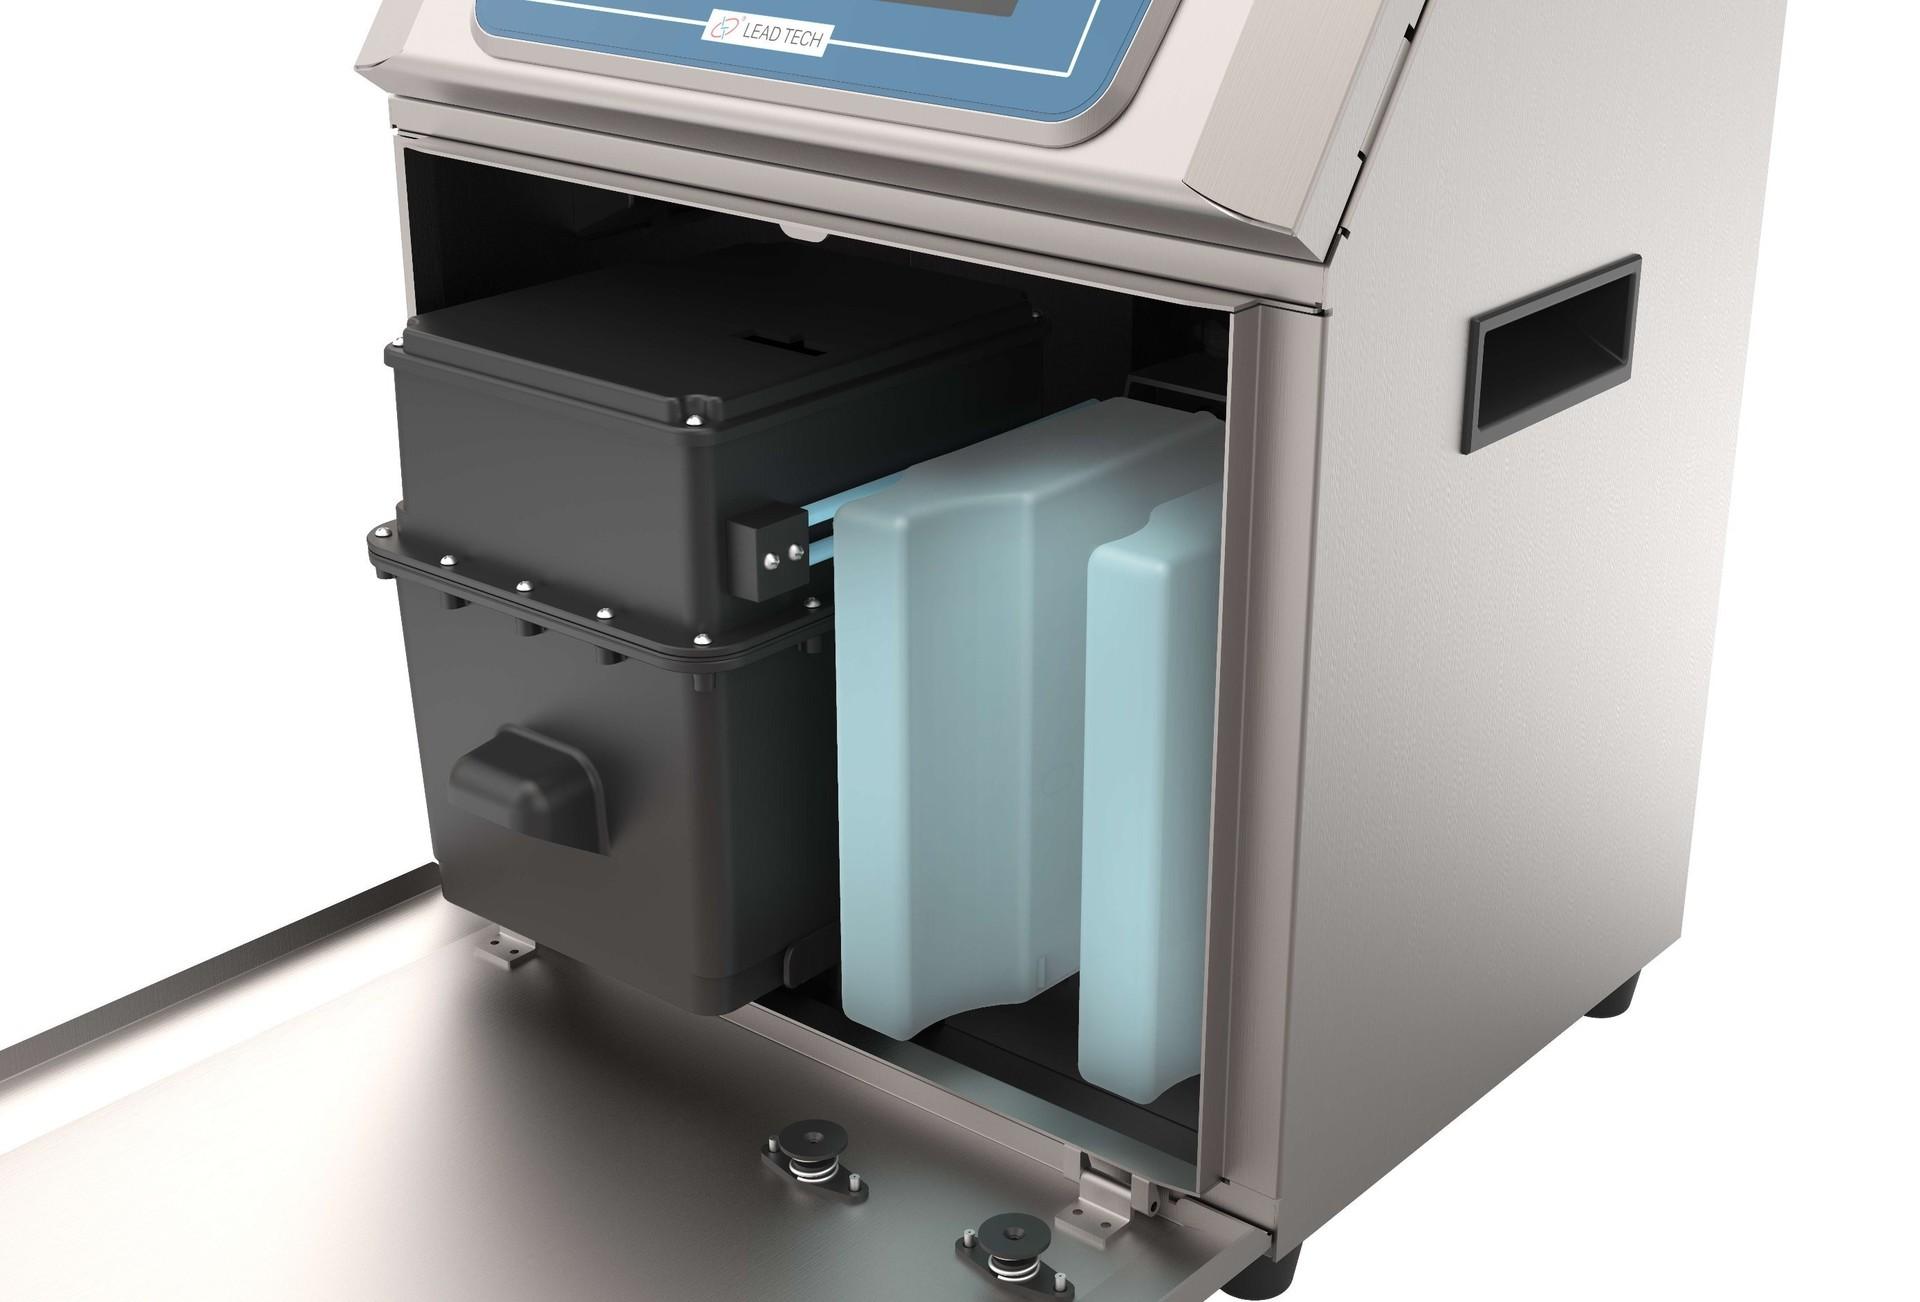 Lead Tech Lt800 Plastic Bottle Cij Inkjet Printer